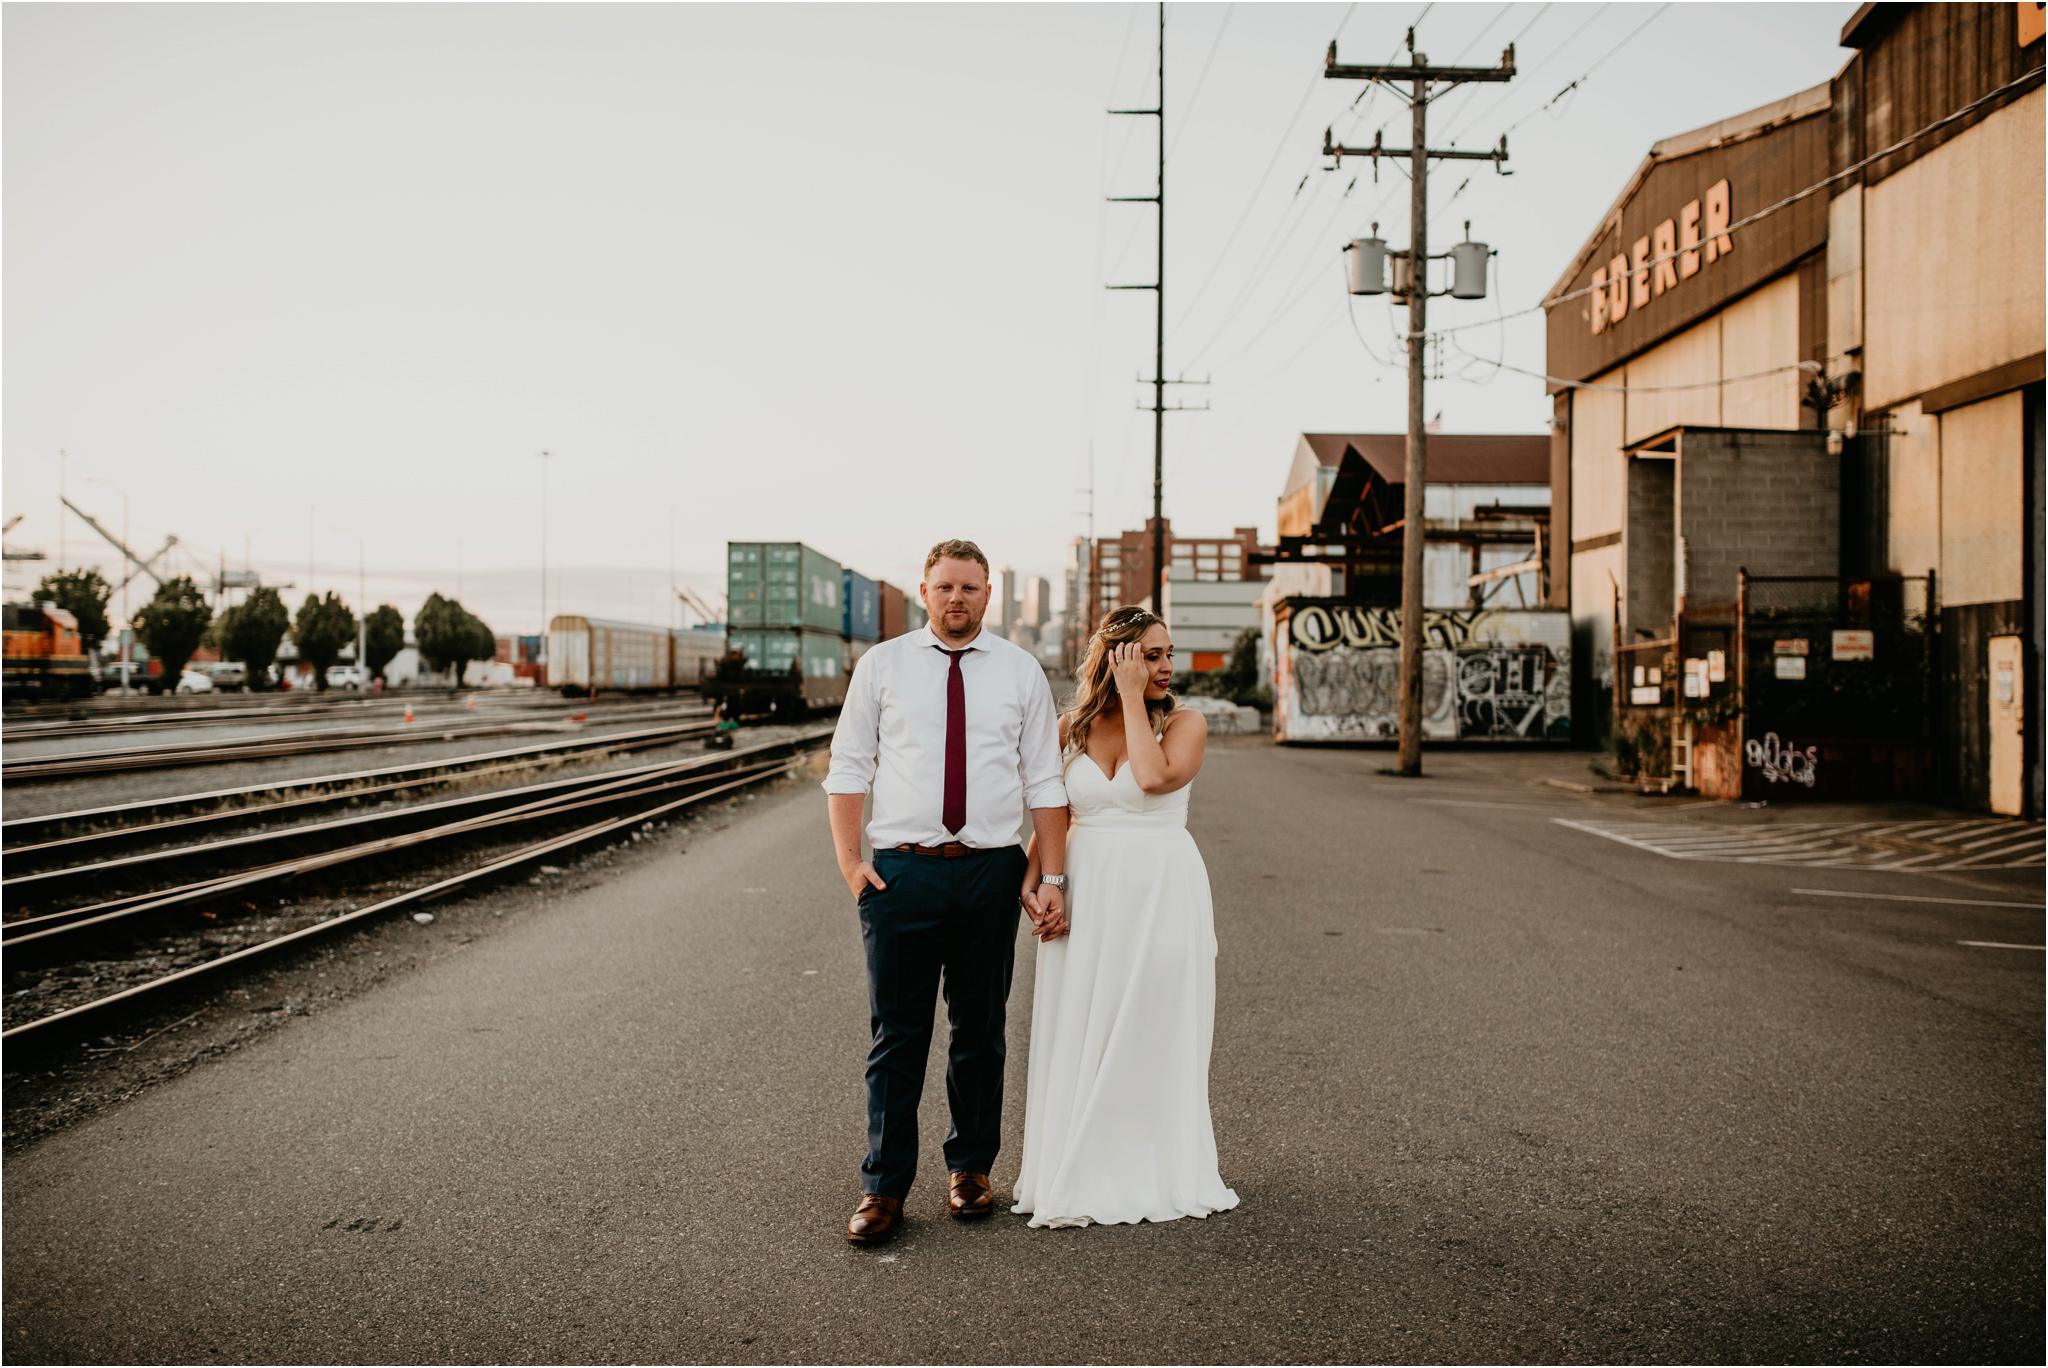 laura-and-matt-metropolist-urban-seattle-wedding-photographer-142.jpg